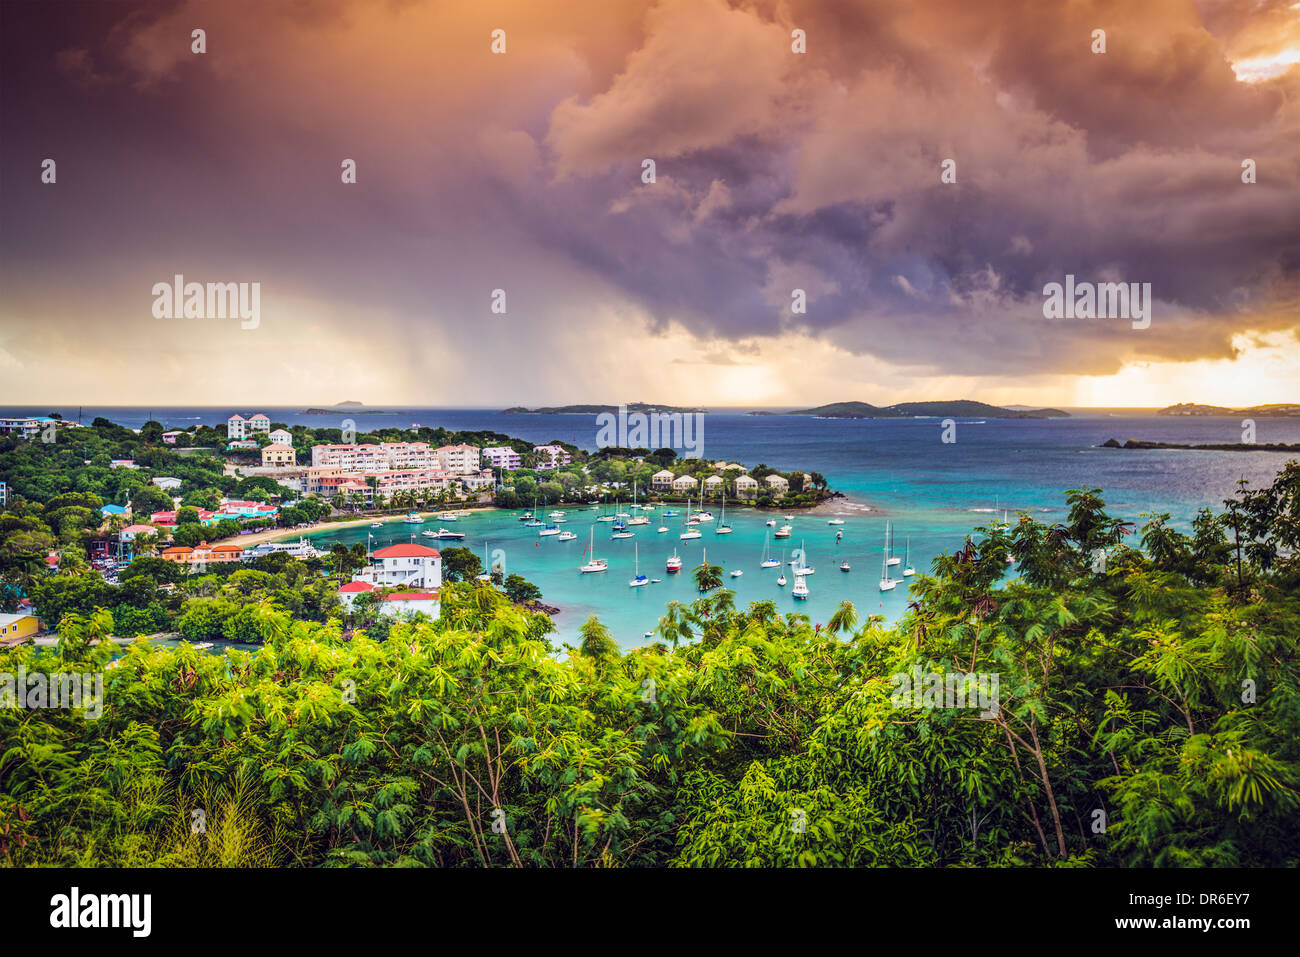 Cruz Bay, St John, United States Virgin Islands. - Stock Image